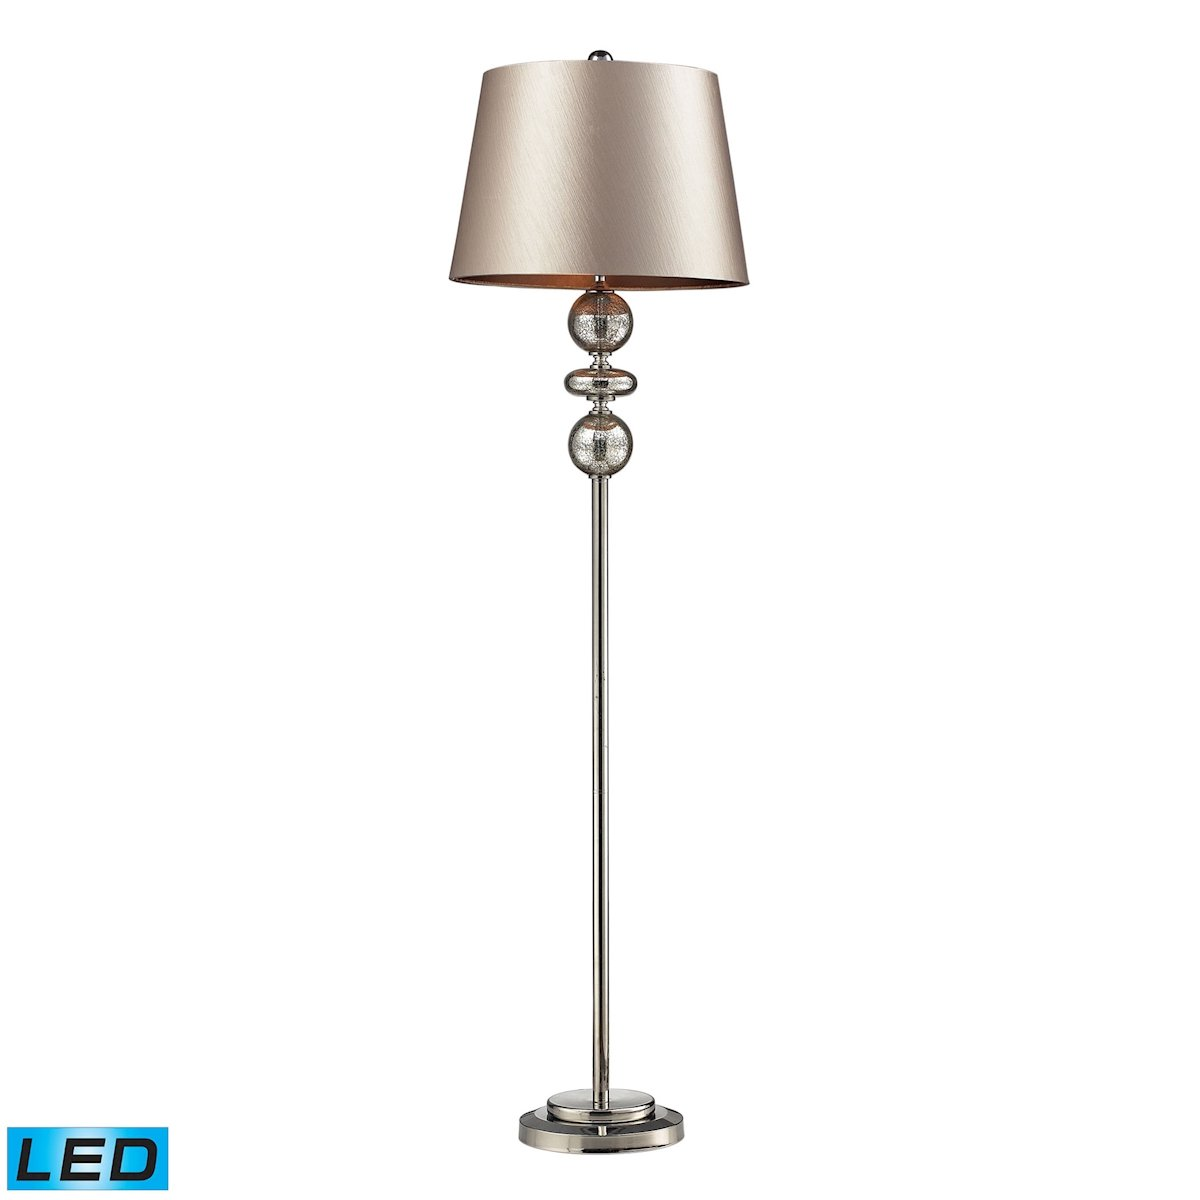 Dimond Lighting Hollis Floor Lamp Polished Nickel